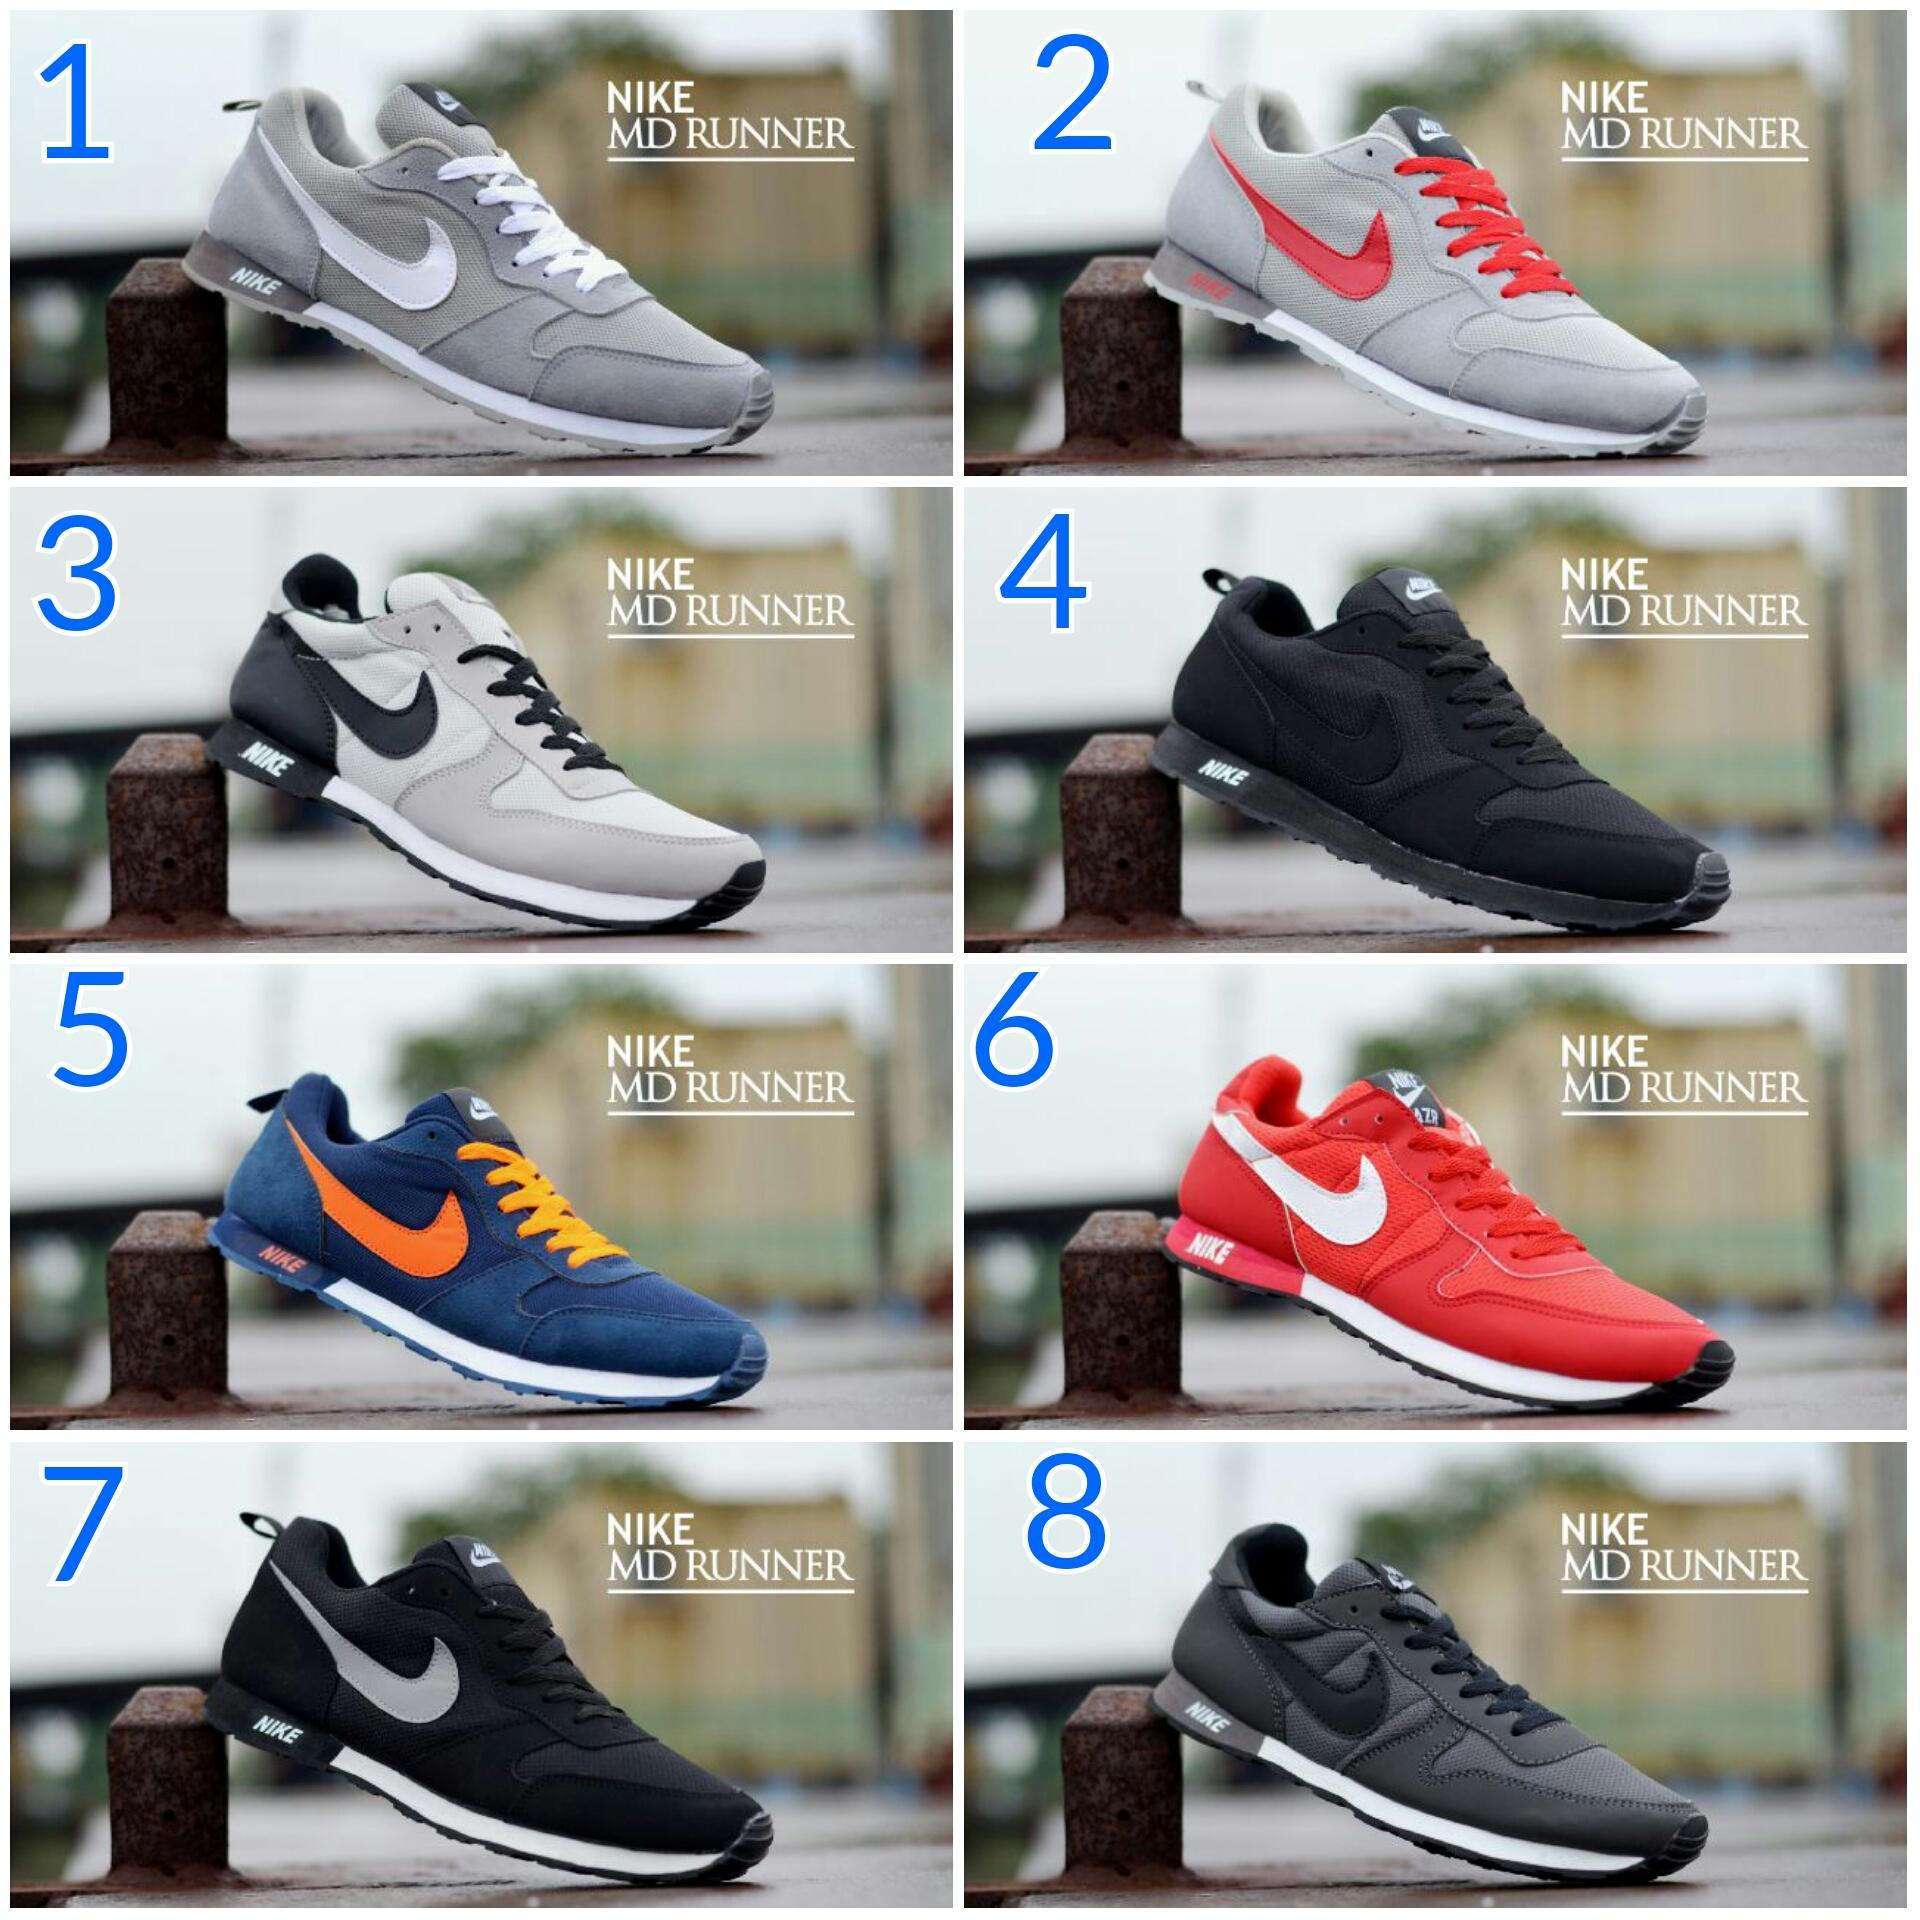 Promo Sepatu Murah Nike MD Runner Casual Pria Original Vietnam Fashion